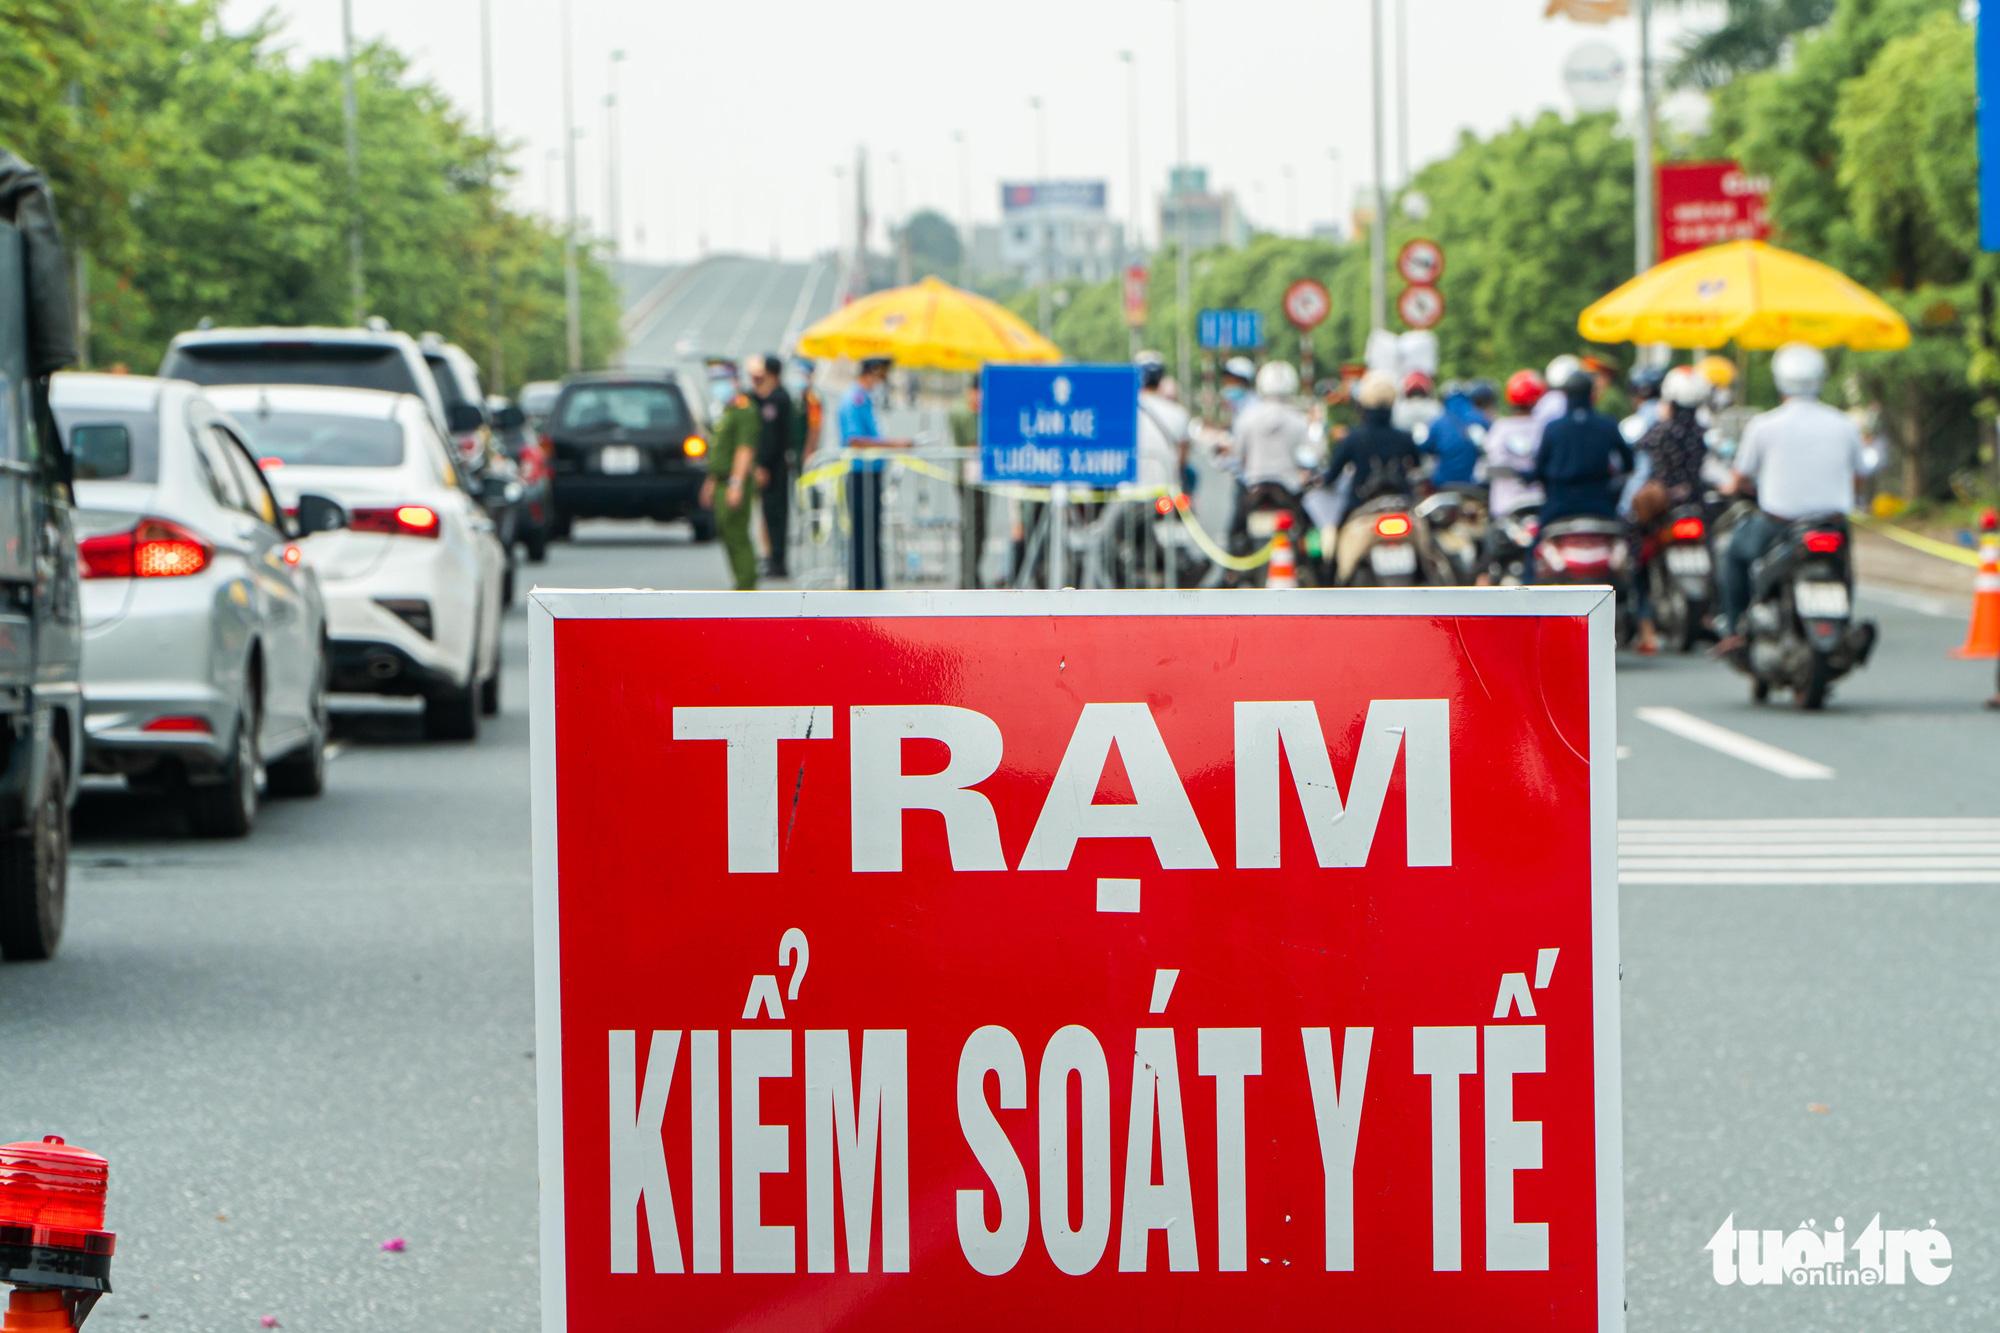 A COVID-19 checkpoint in Hanoi, September 6, 2021. Photo: Pham Tuan / Tuoi Tre